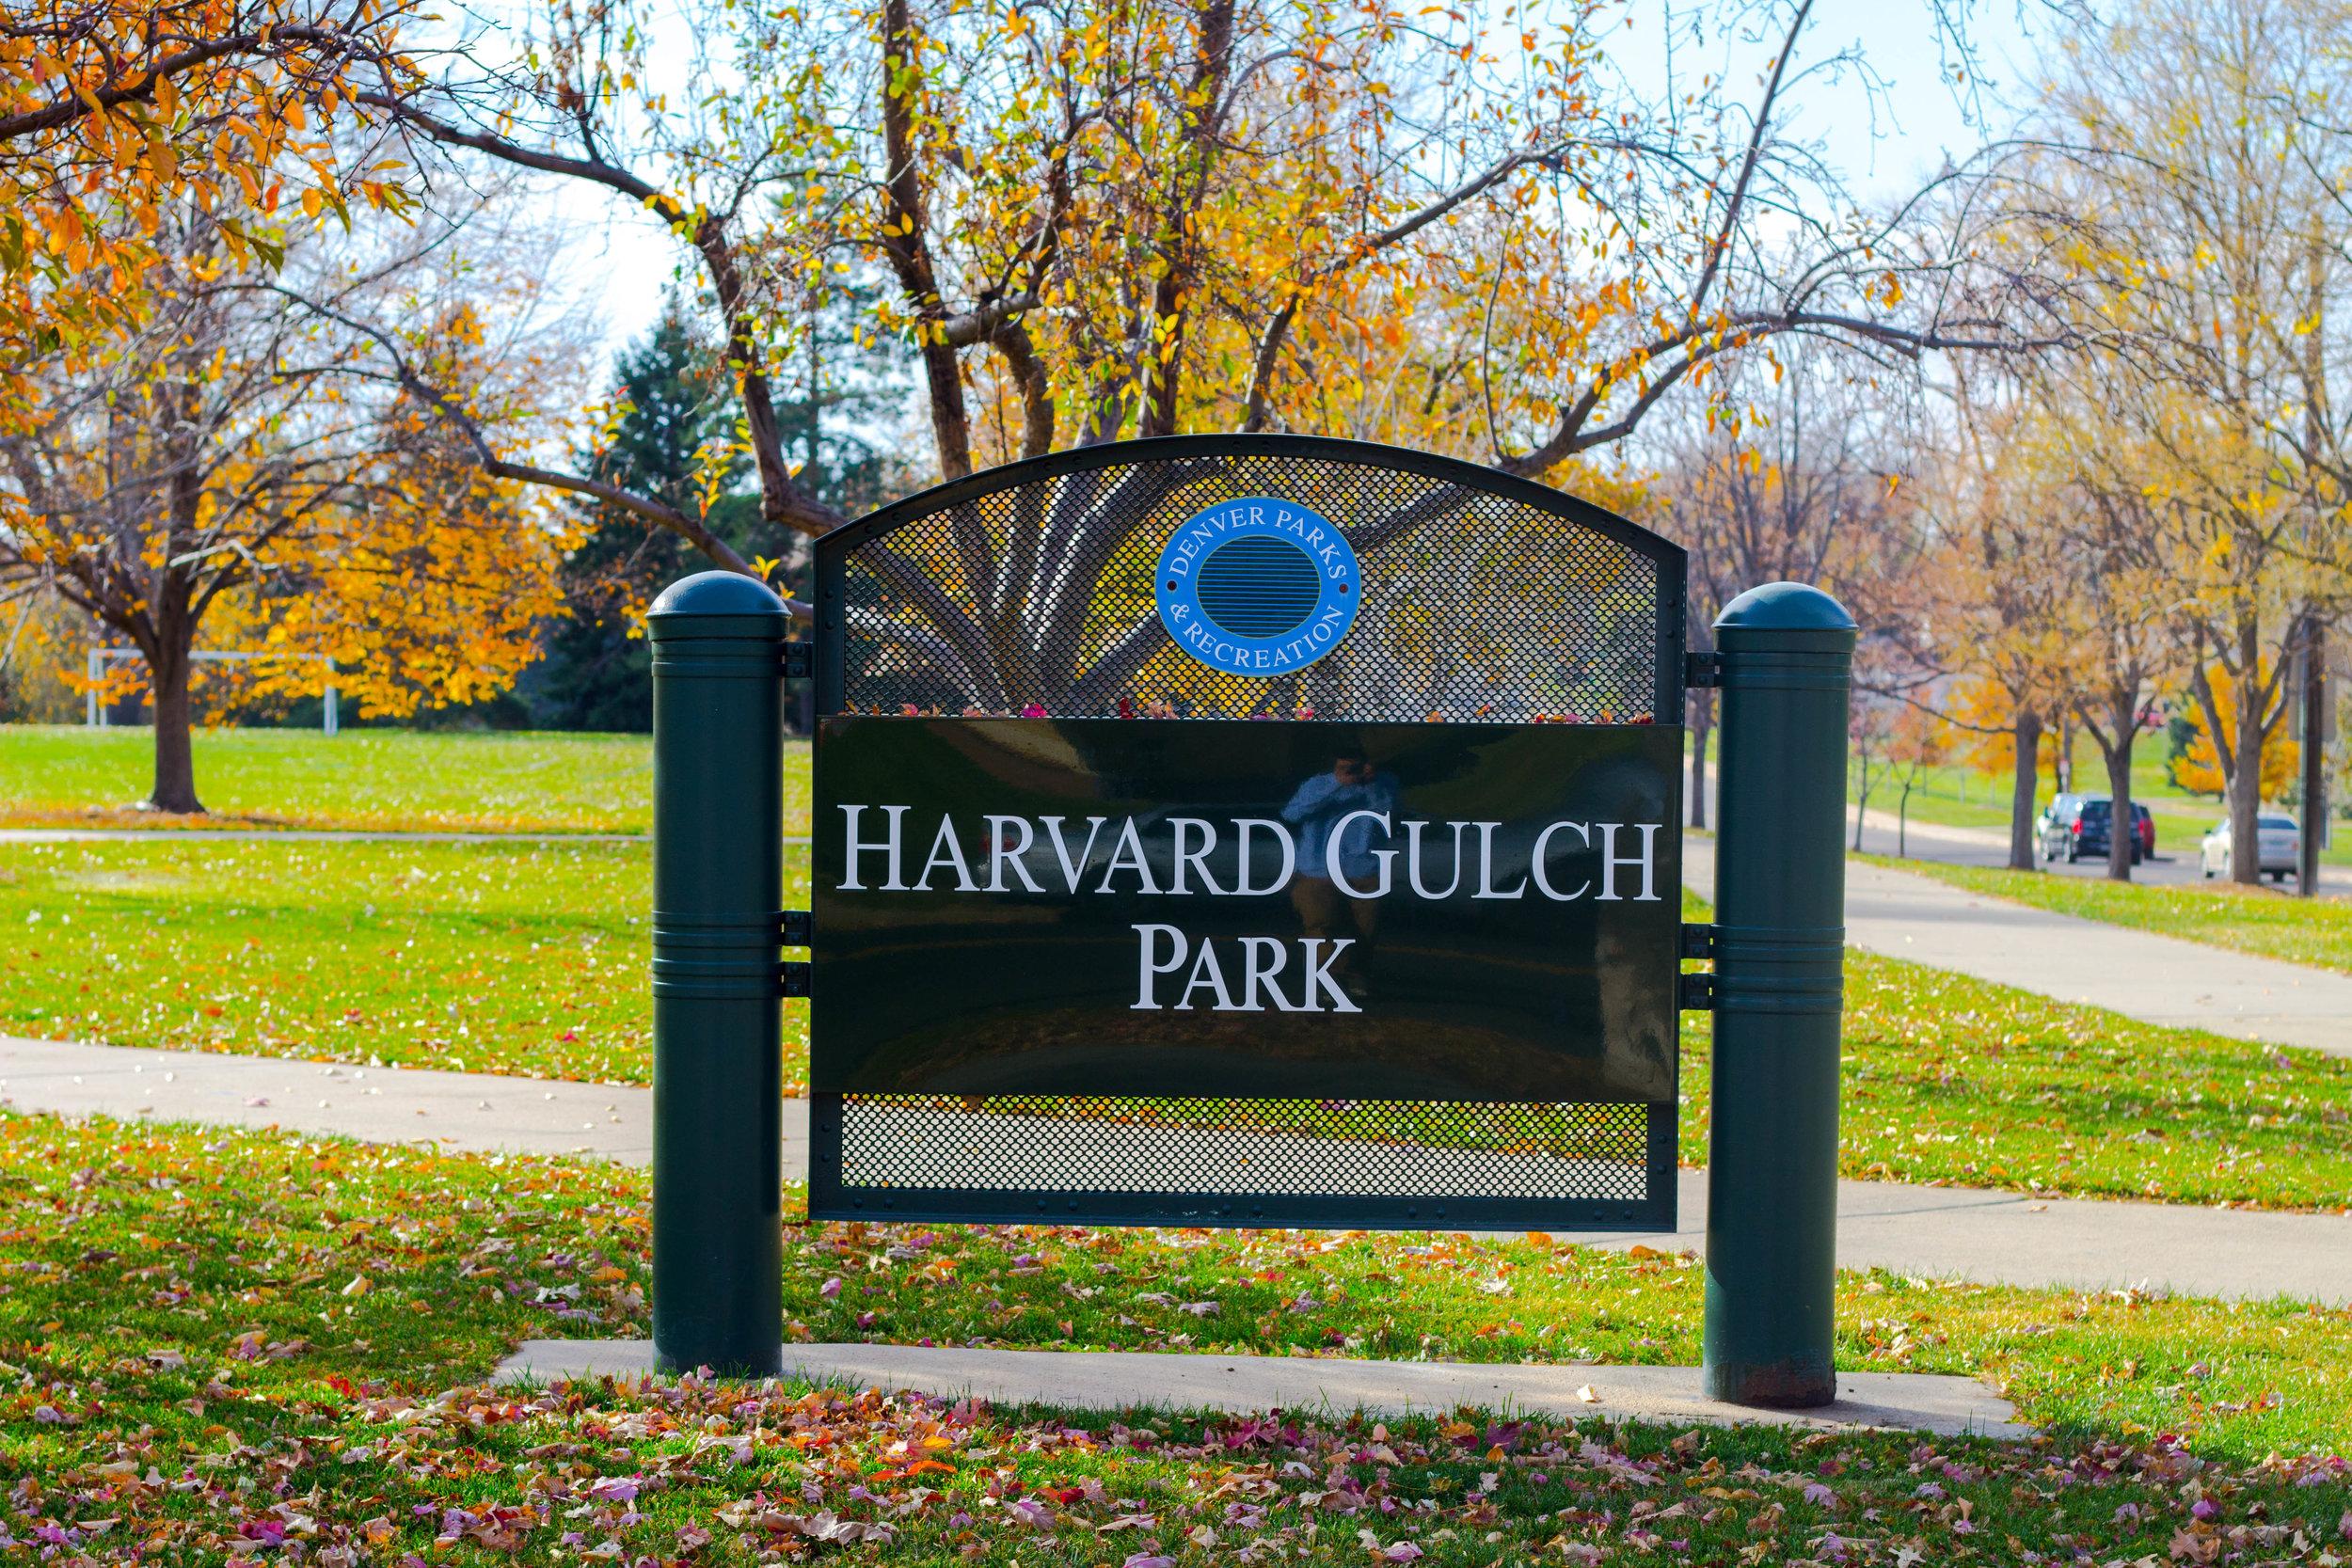 Harvard Gulch Park